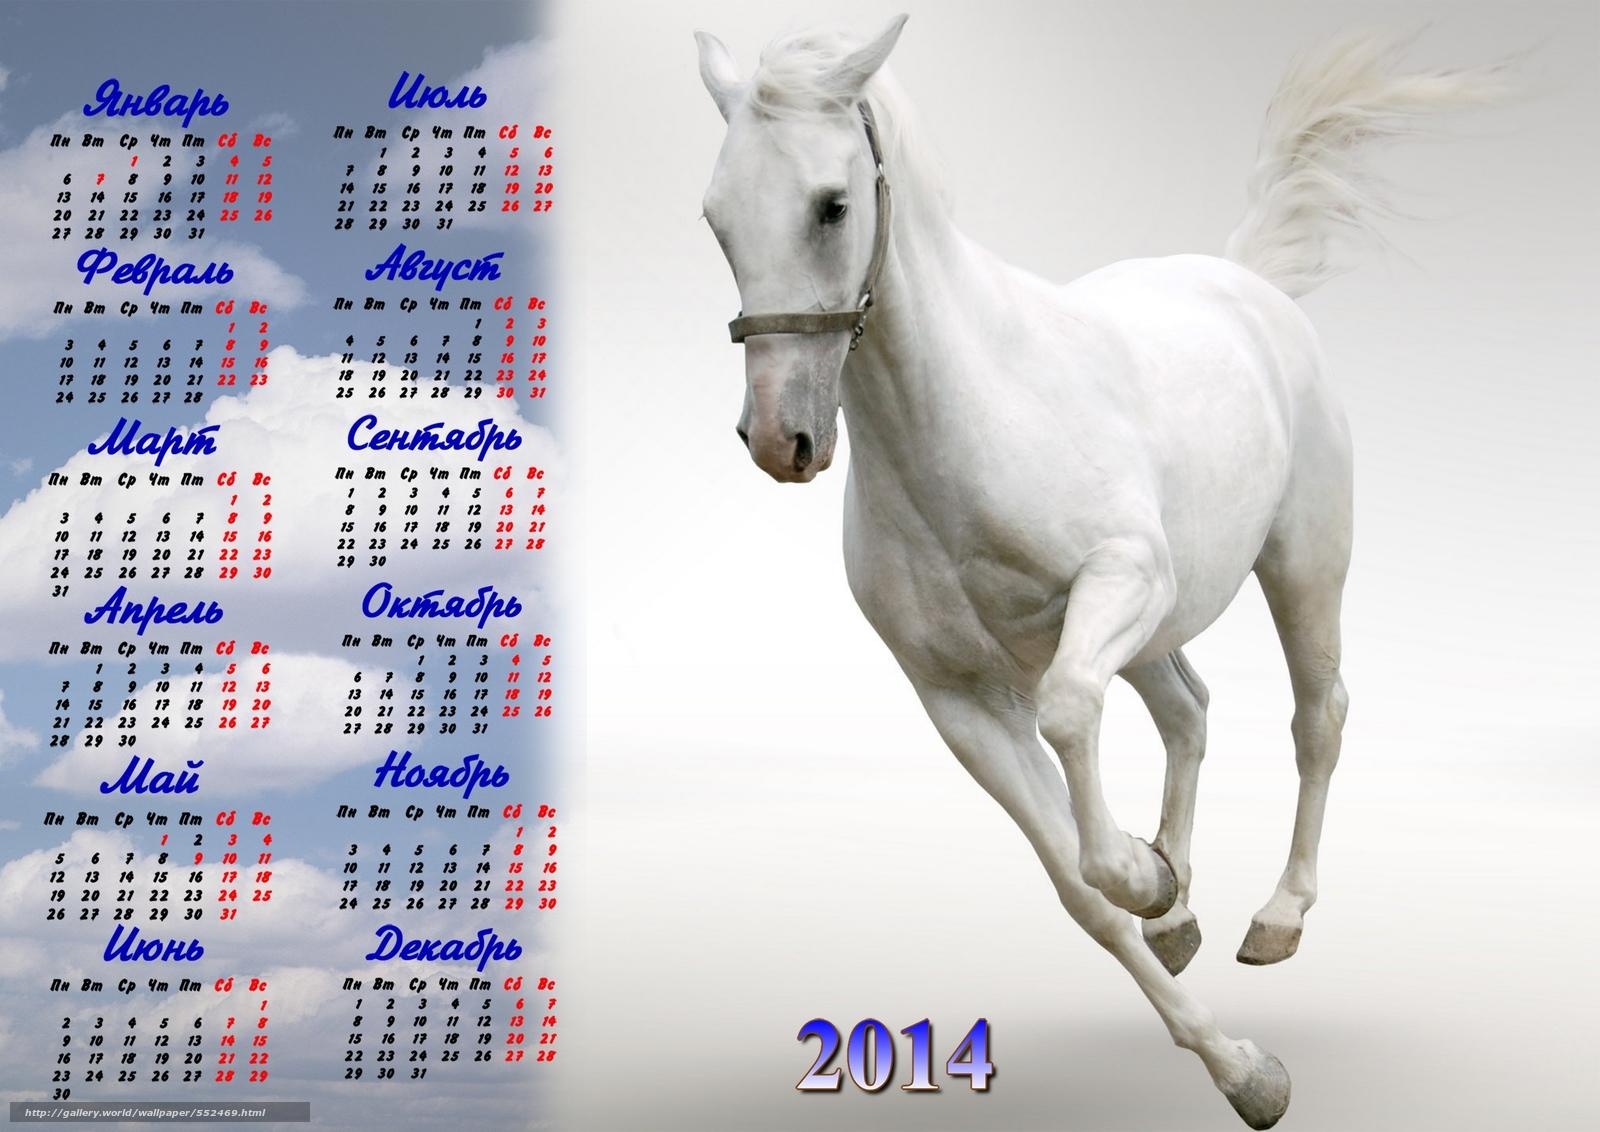 Календарь, 2014 год, год лошади, фото, обои, картинка #552469 ...